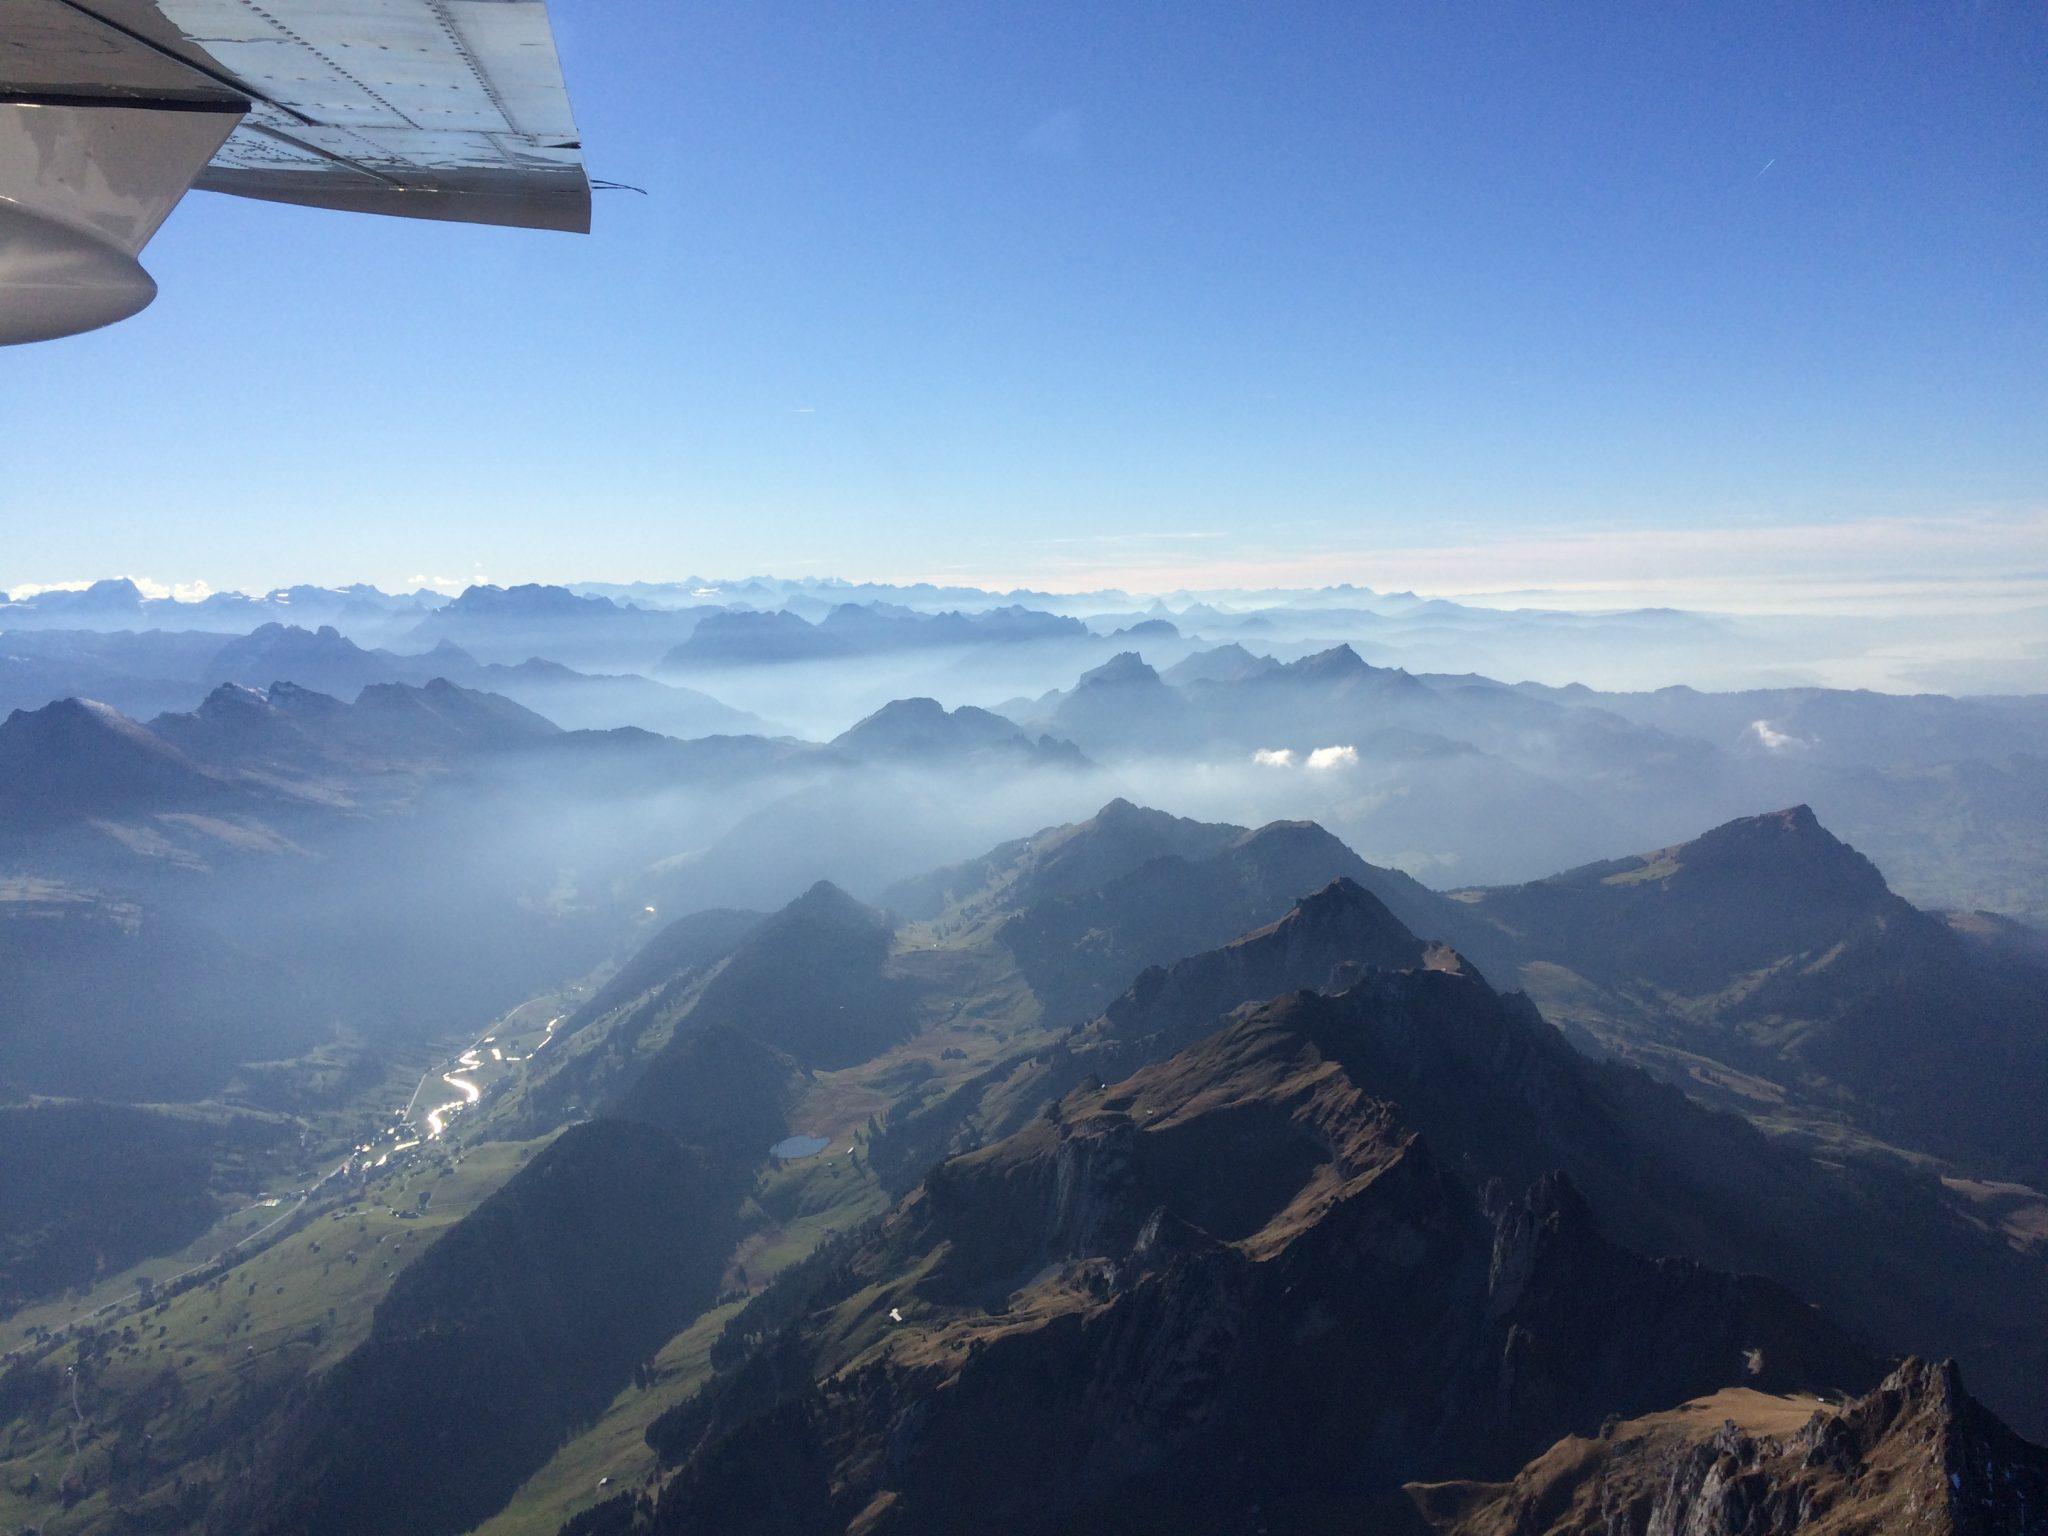 Matterhorn Rundflug - Auf dem Weg